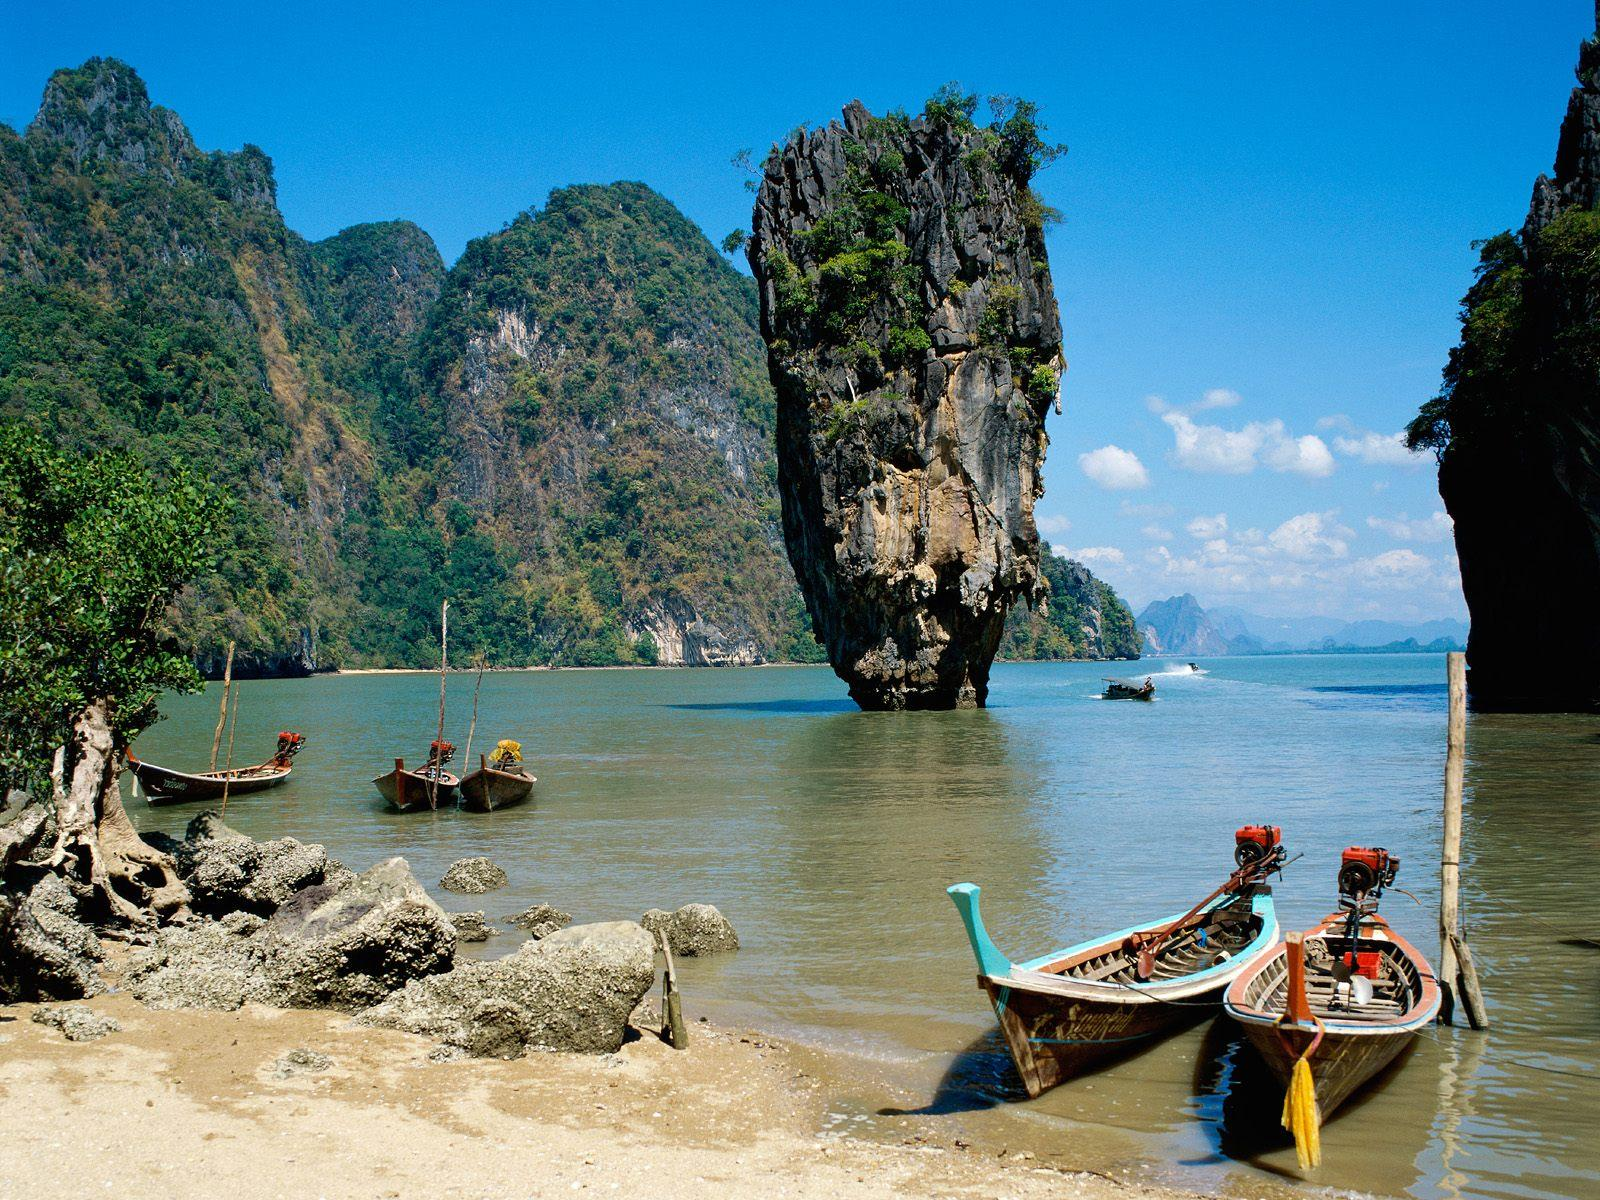 http://2.bp.blogspot.com/-T_c3emJ_m_M/USIGx1hFYII/AAAAAAAAAZk/68qEzRTVtRw/s1600/honeymoon-thailand1.jpg